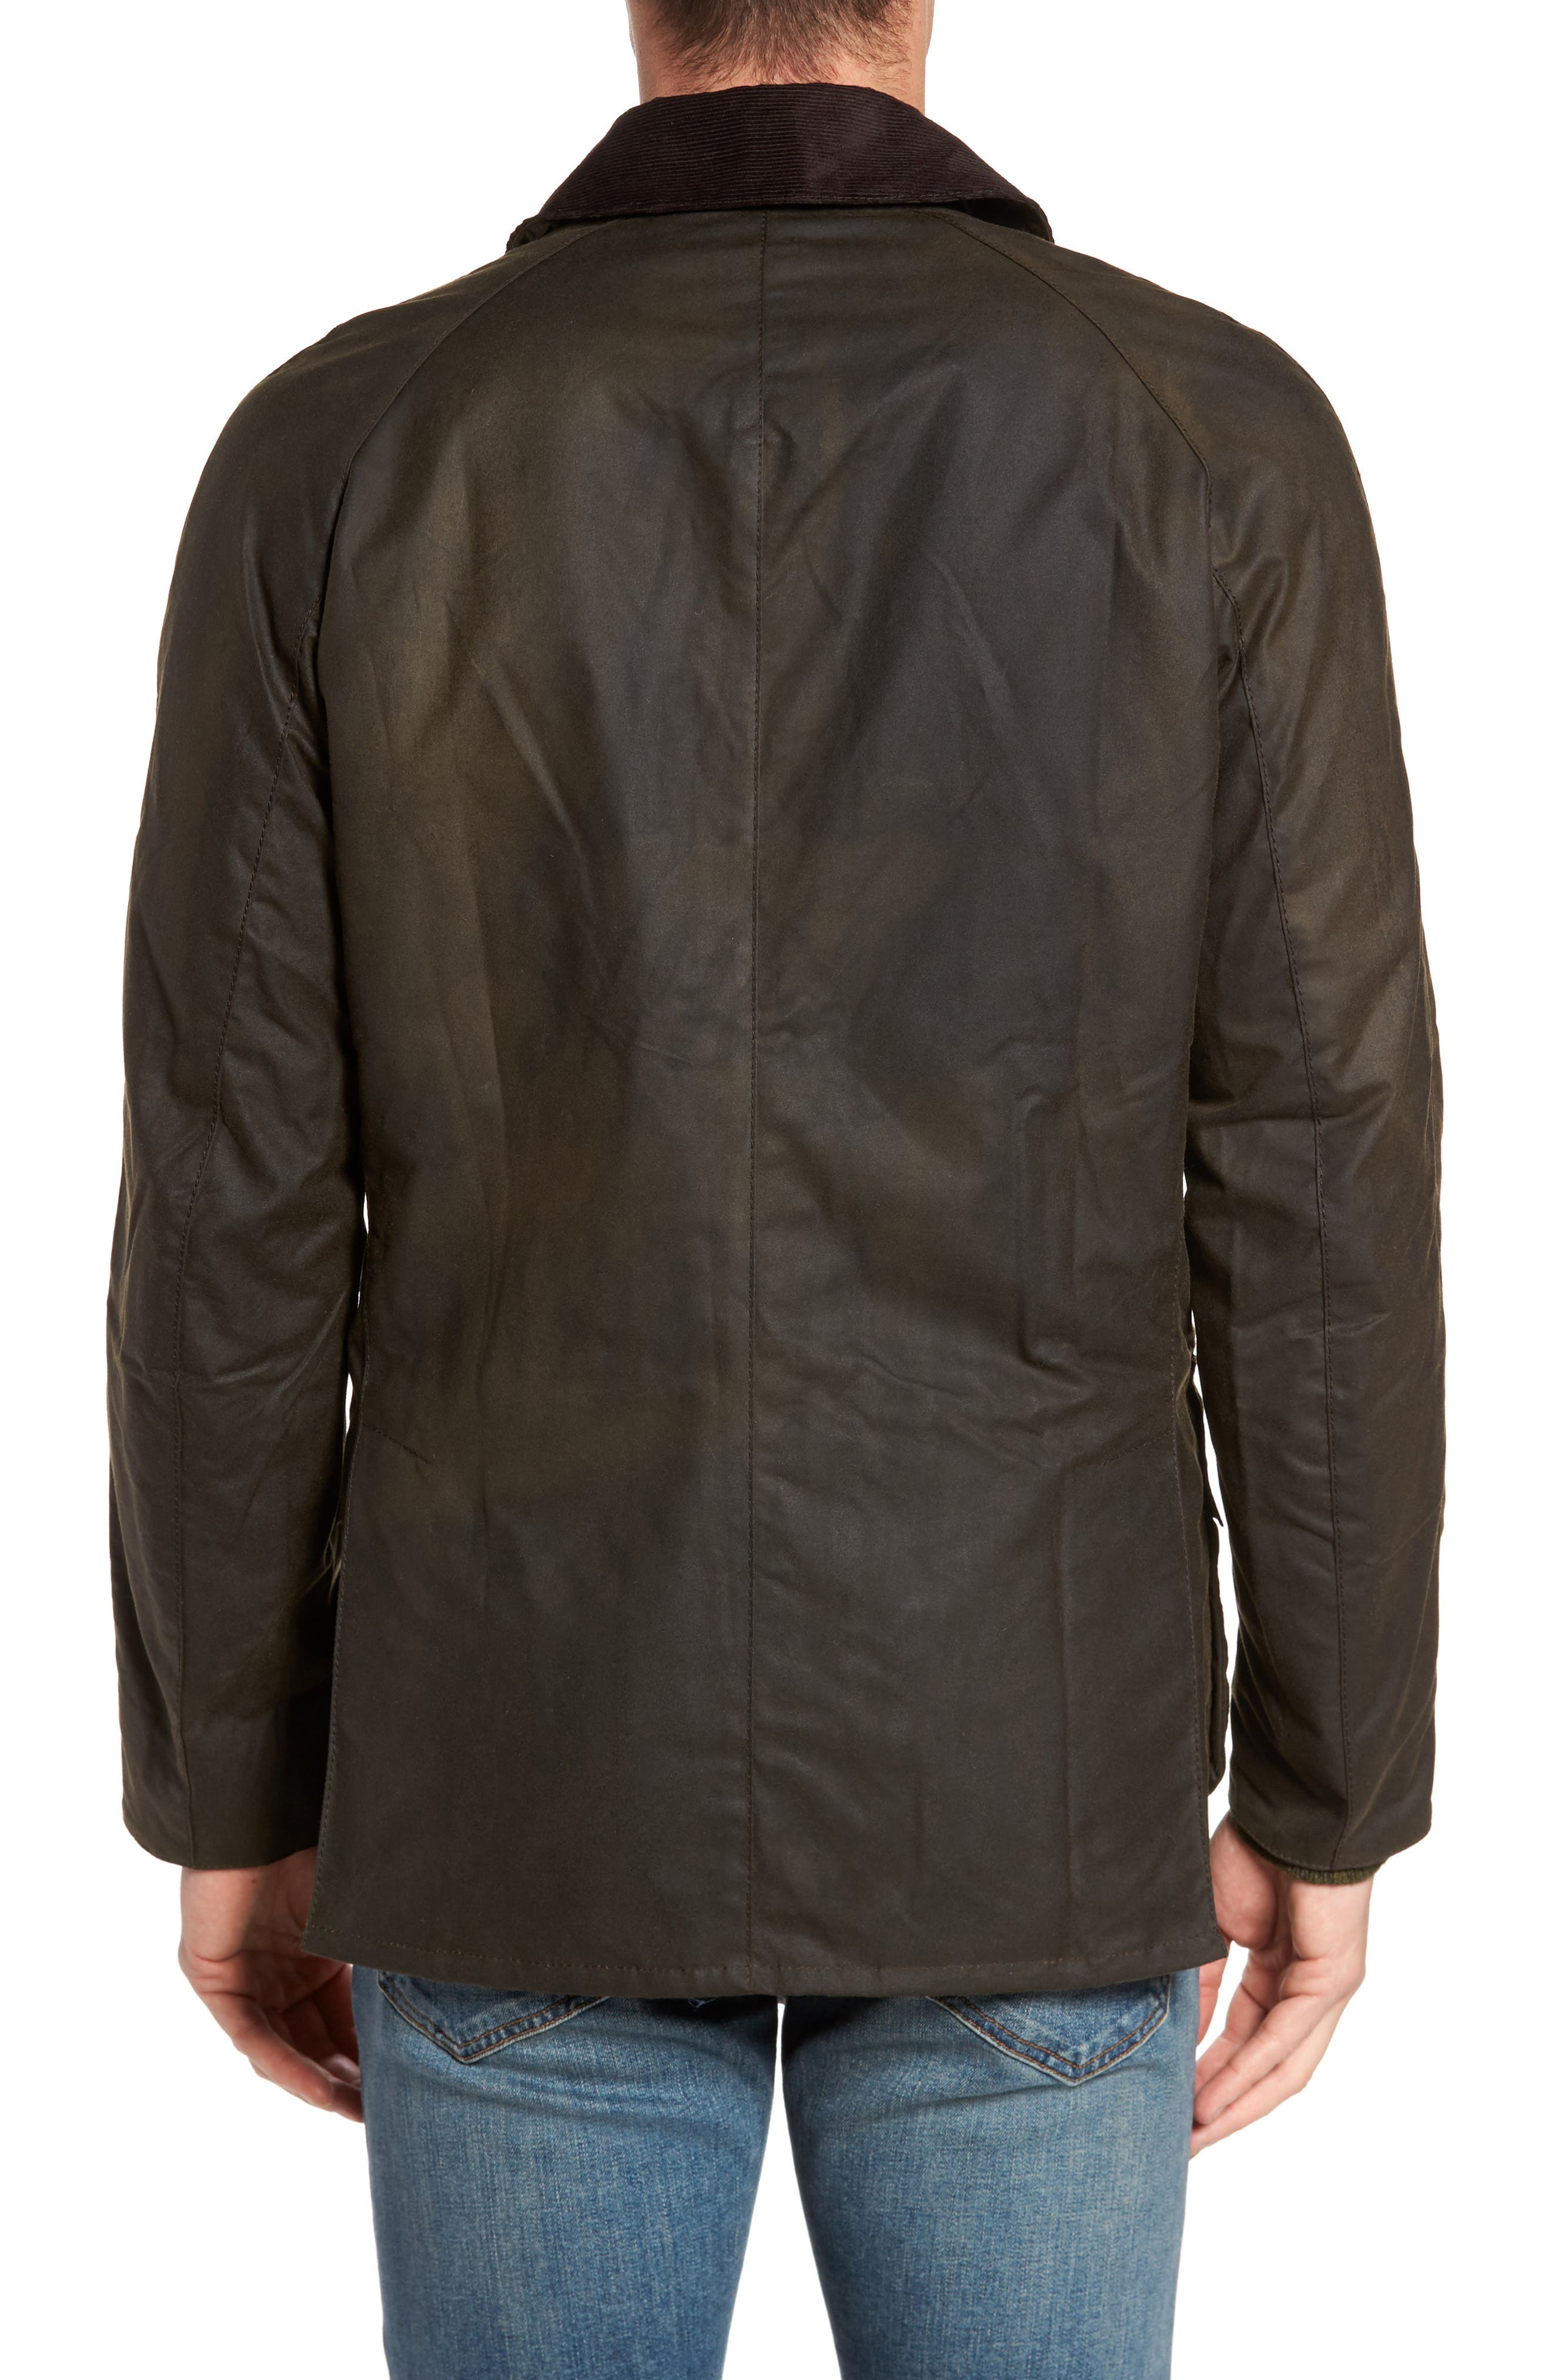 'Ashby' Regular Fit Waterproof Jacket,                             Alternate thumbnail 2, color,                             340